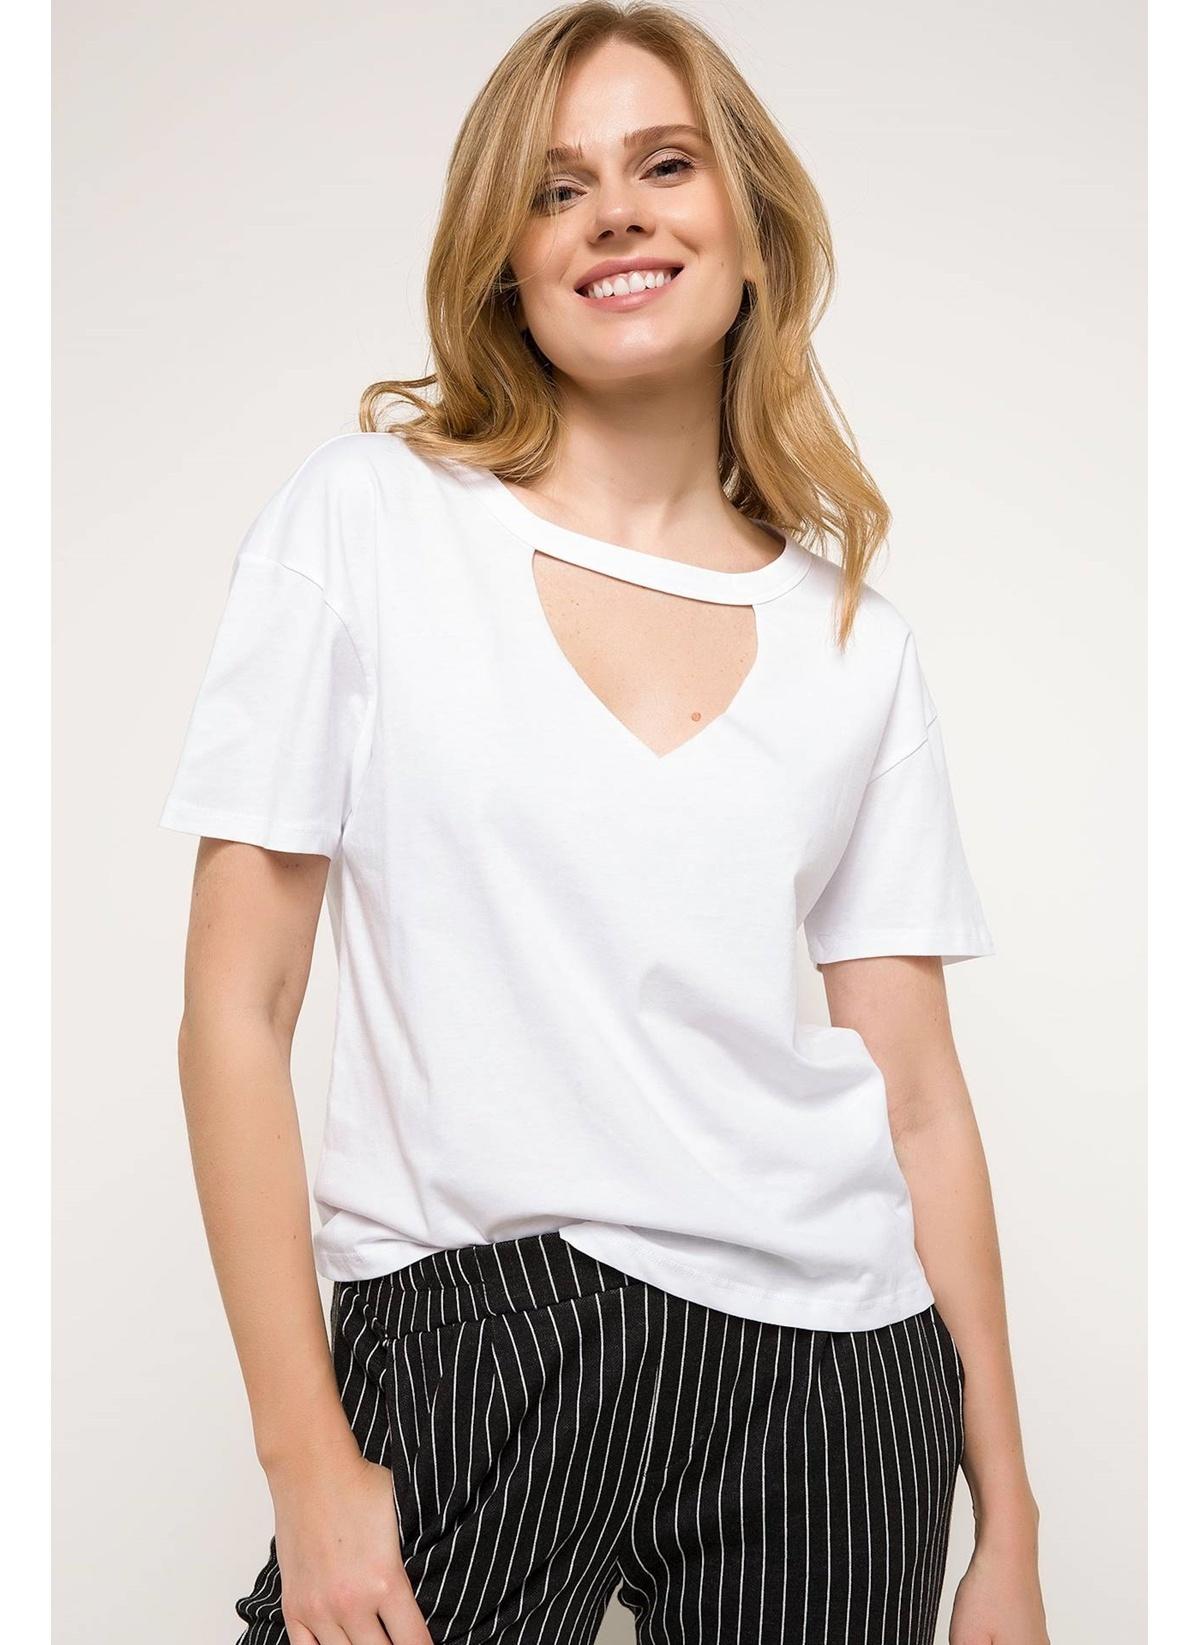 Defacto Choker Detaylı T-shirt I4218az18spwt34t-shirt – 19.99 TL